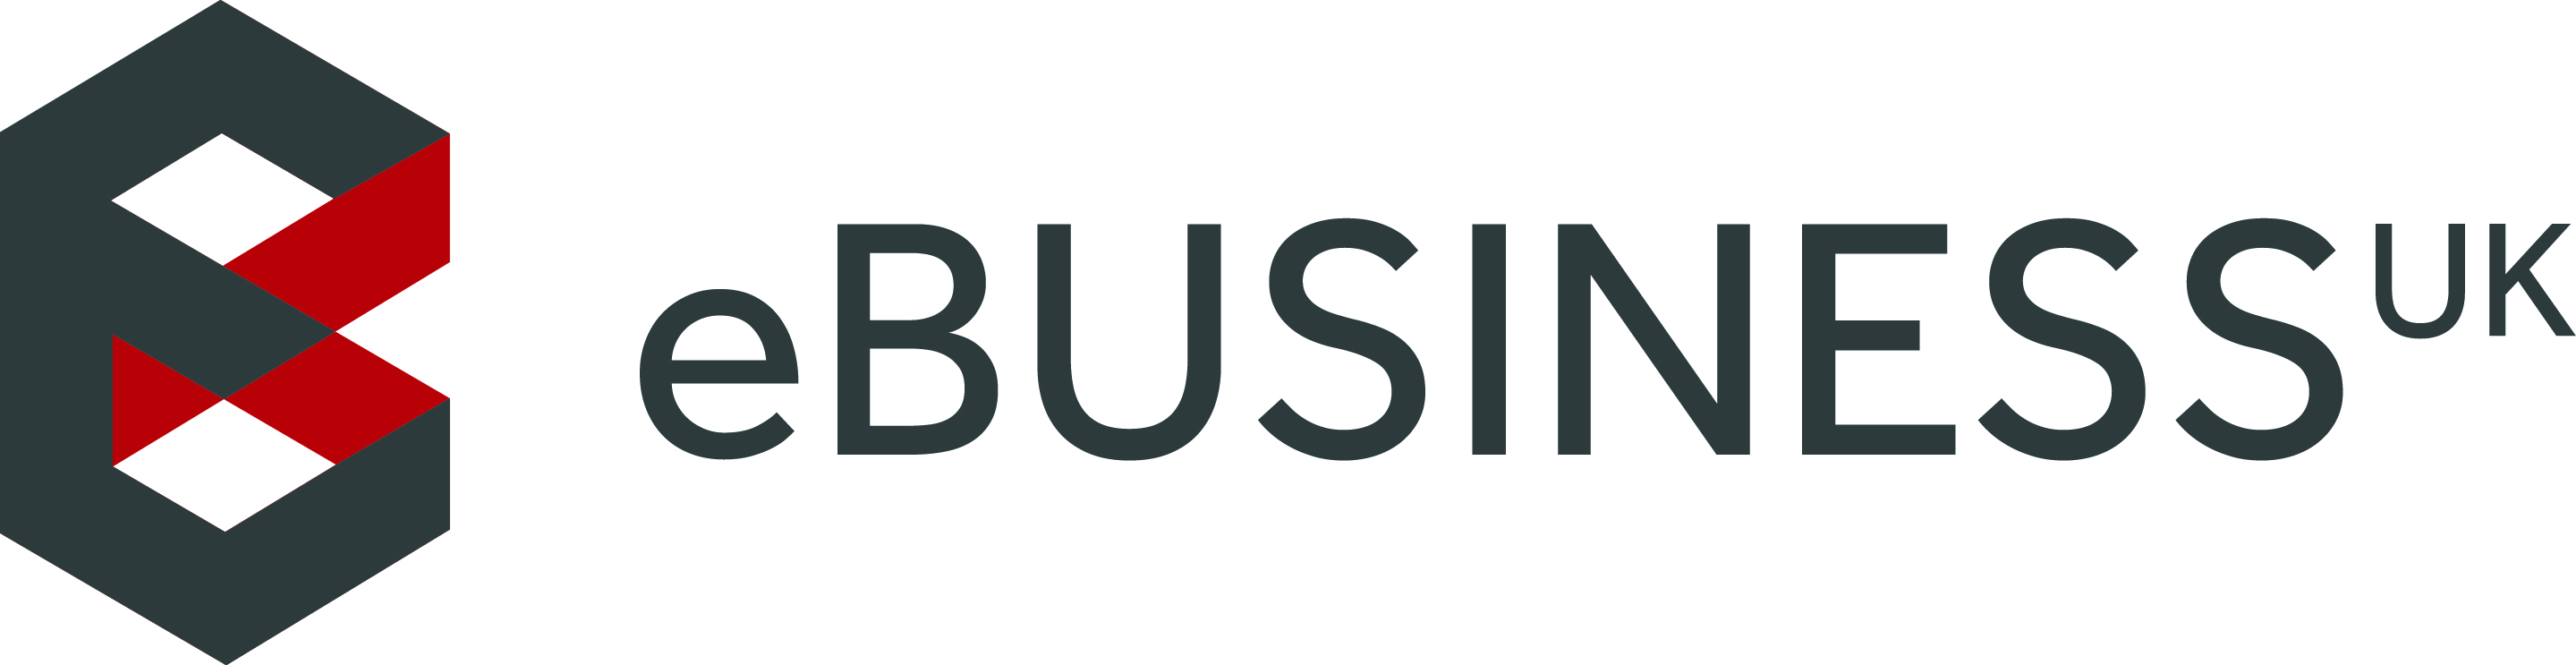 eBusiness UK